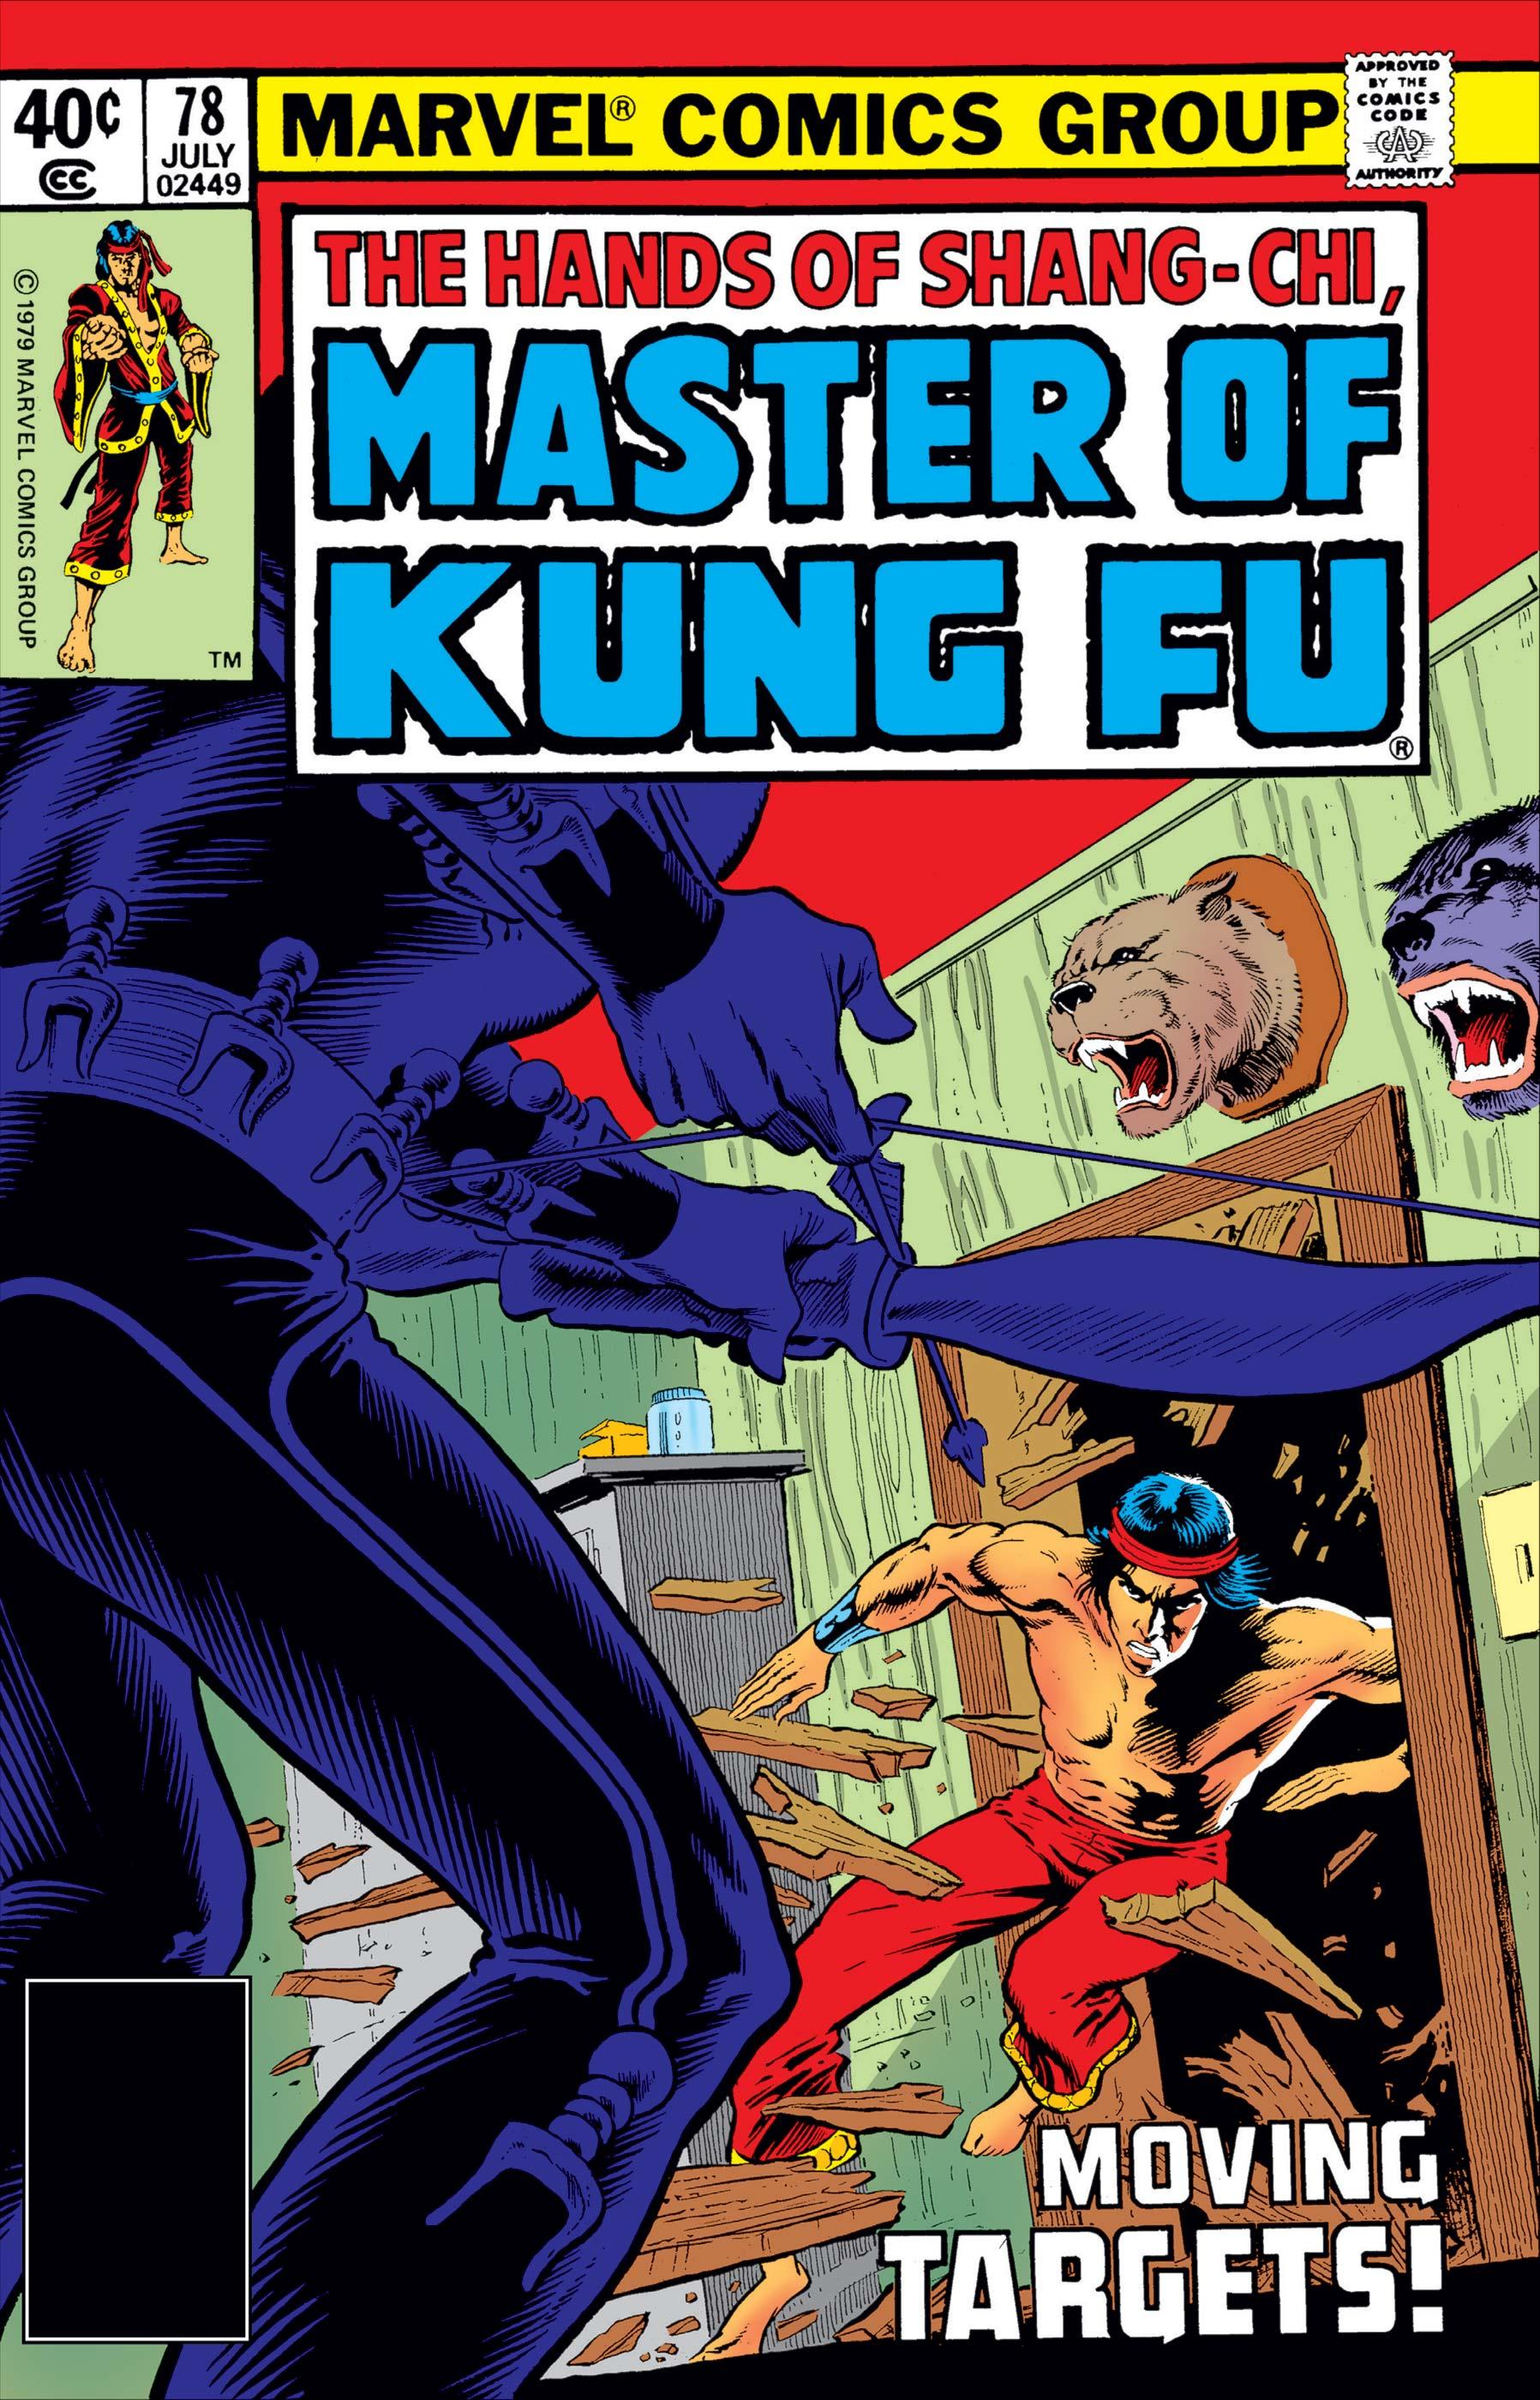 Master of Kung Fu (1974) #78